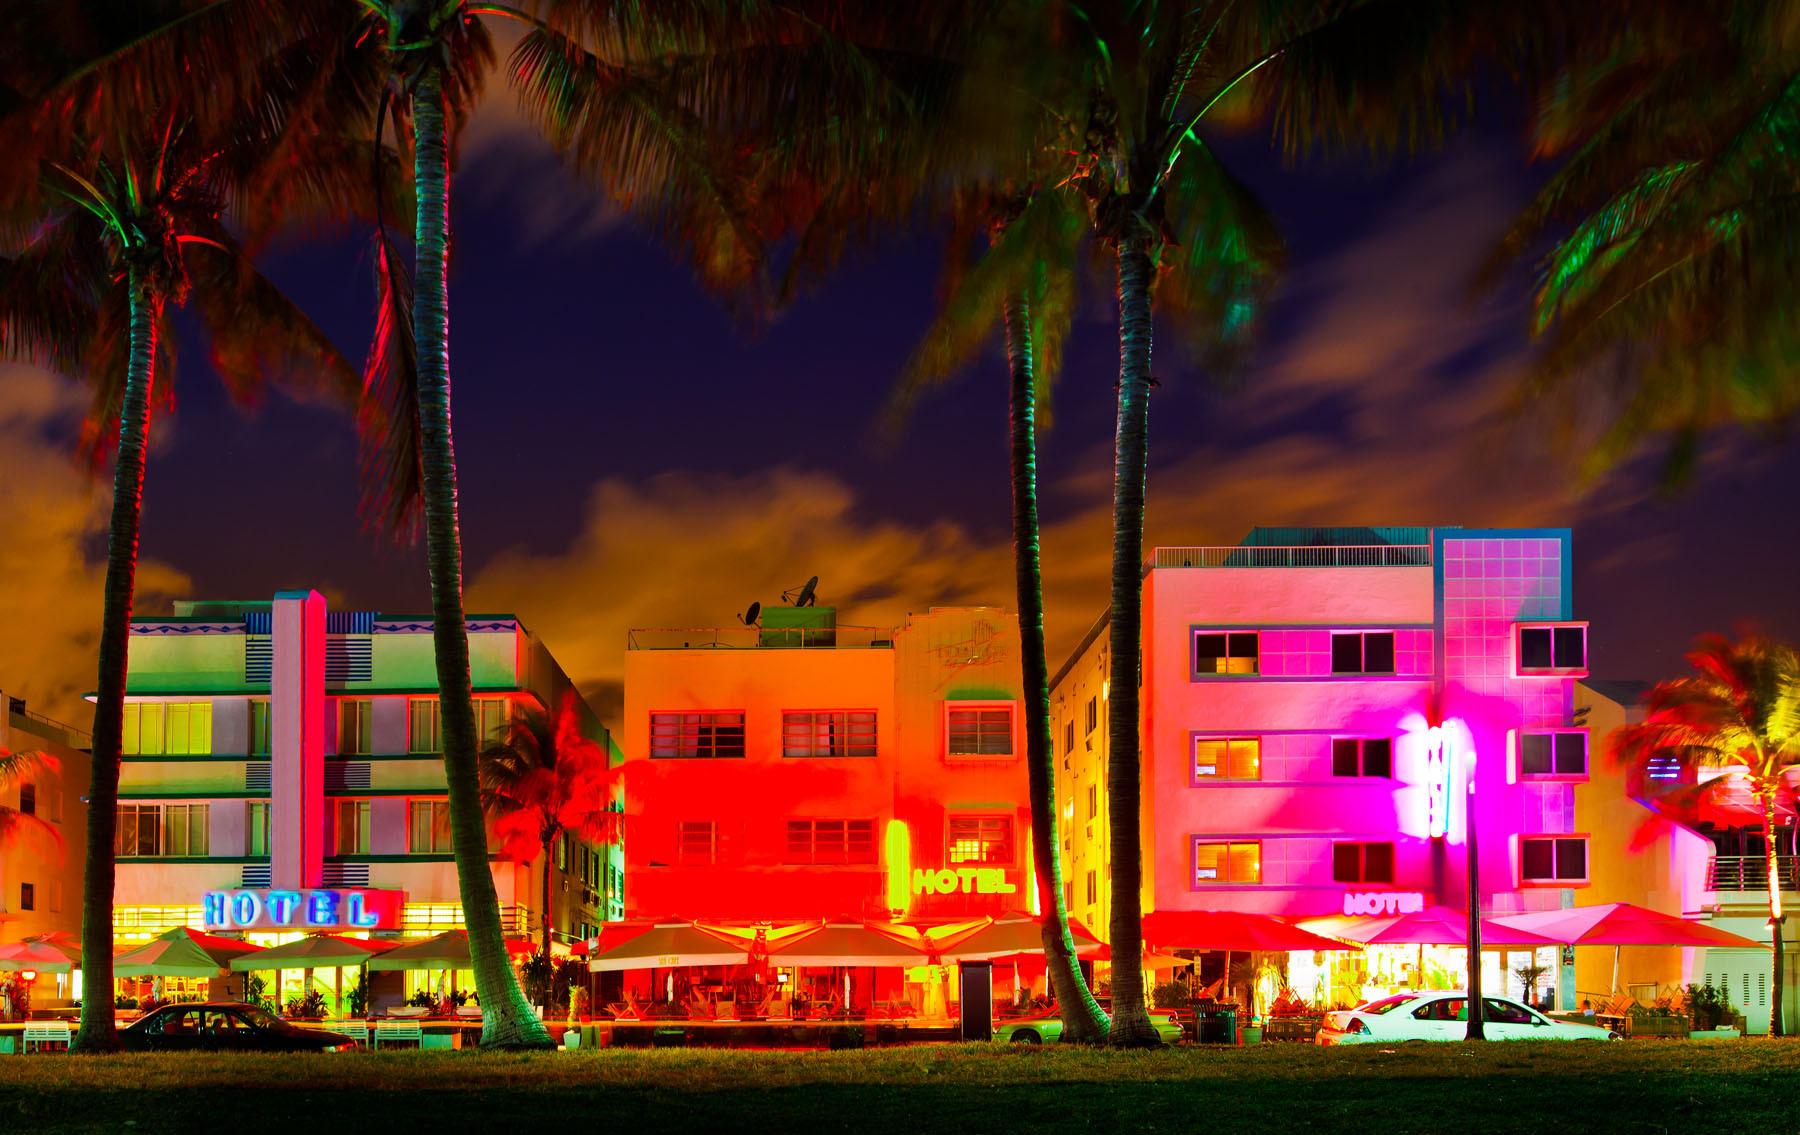 Colourful South Beach Miami Art Deco District - Image courtesy:  rushtravellifestyle.com